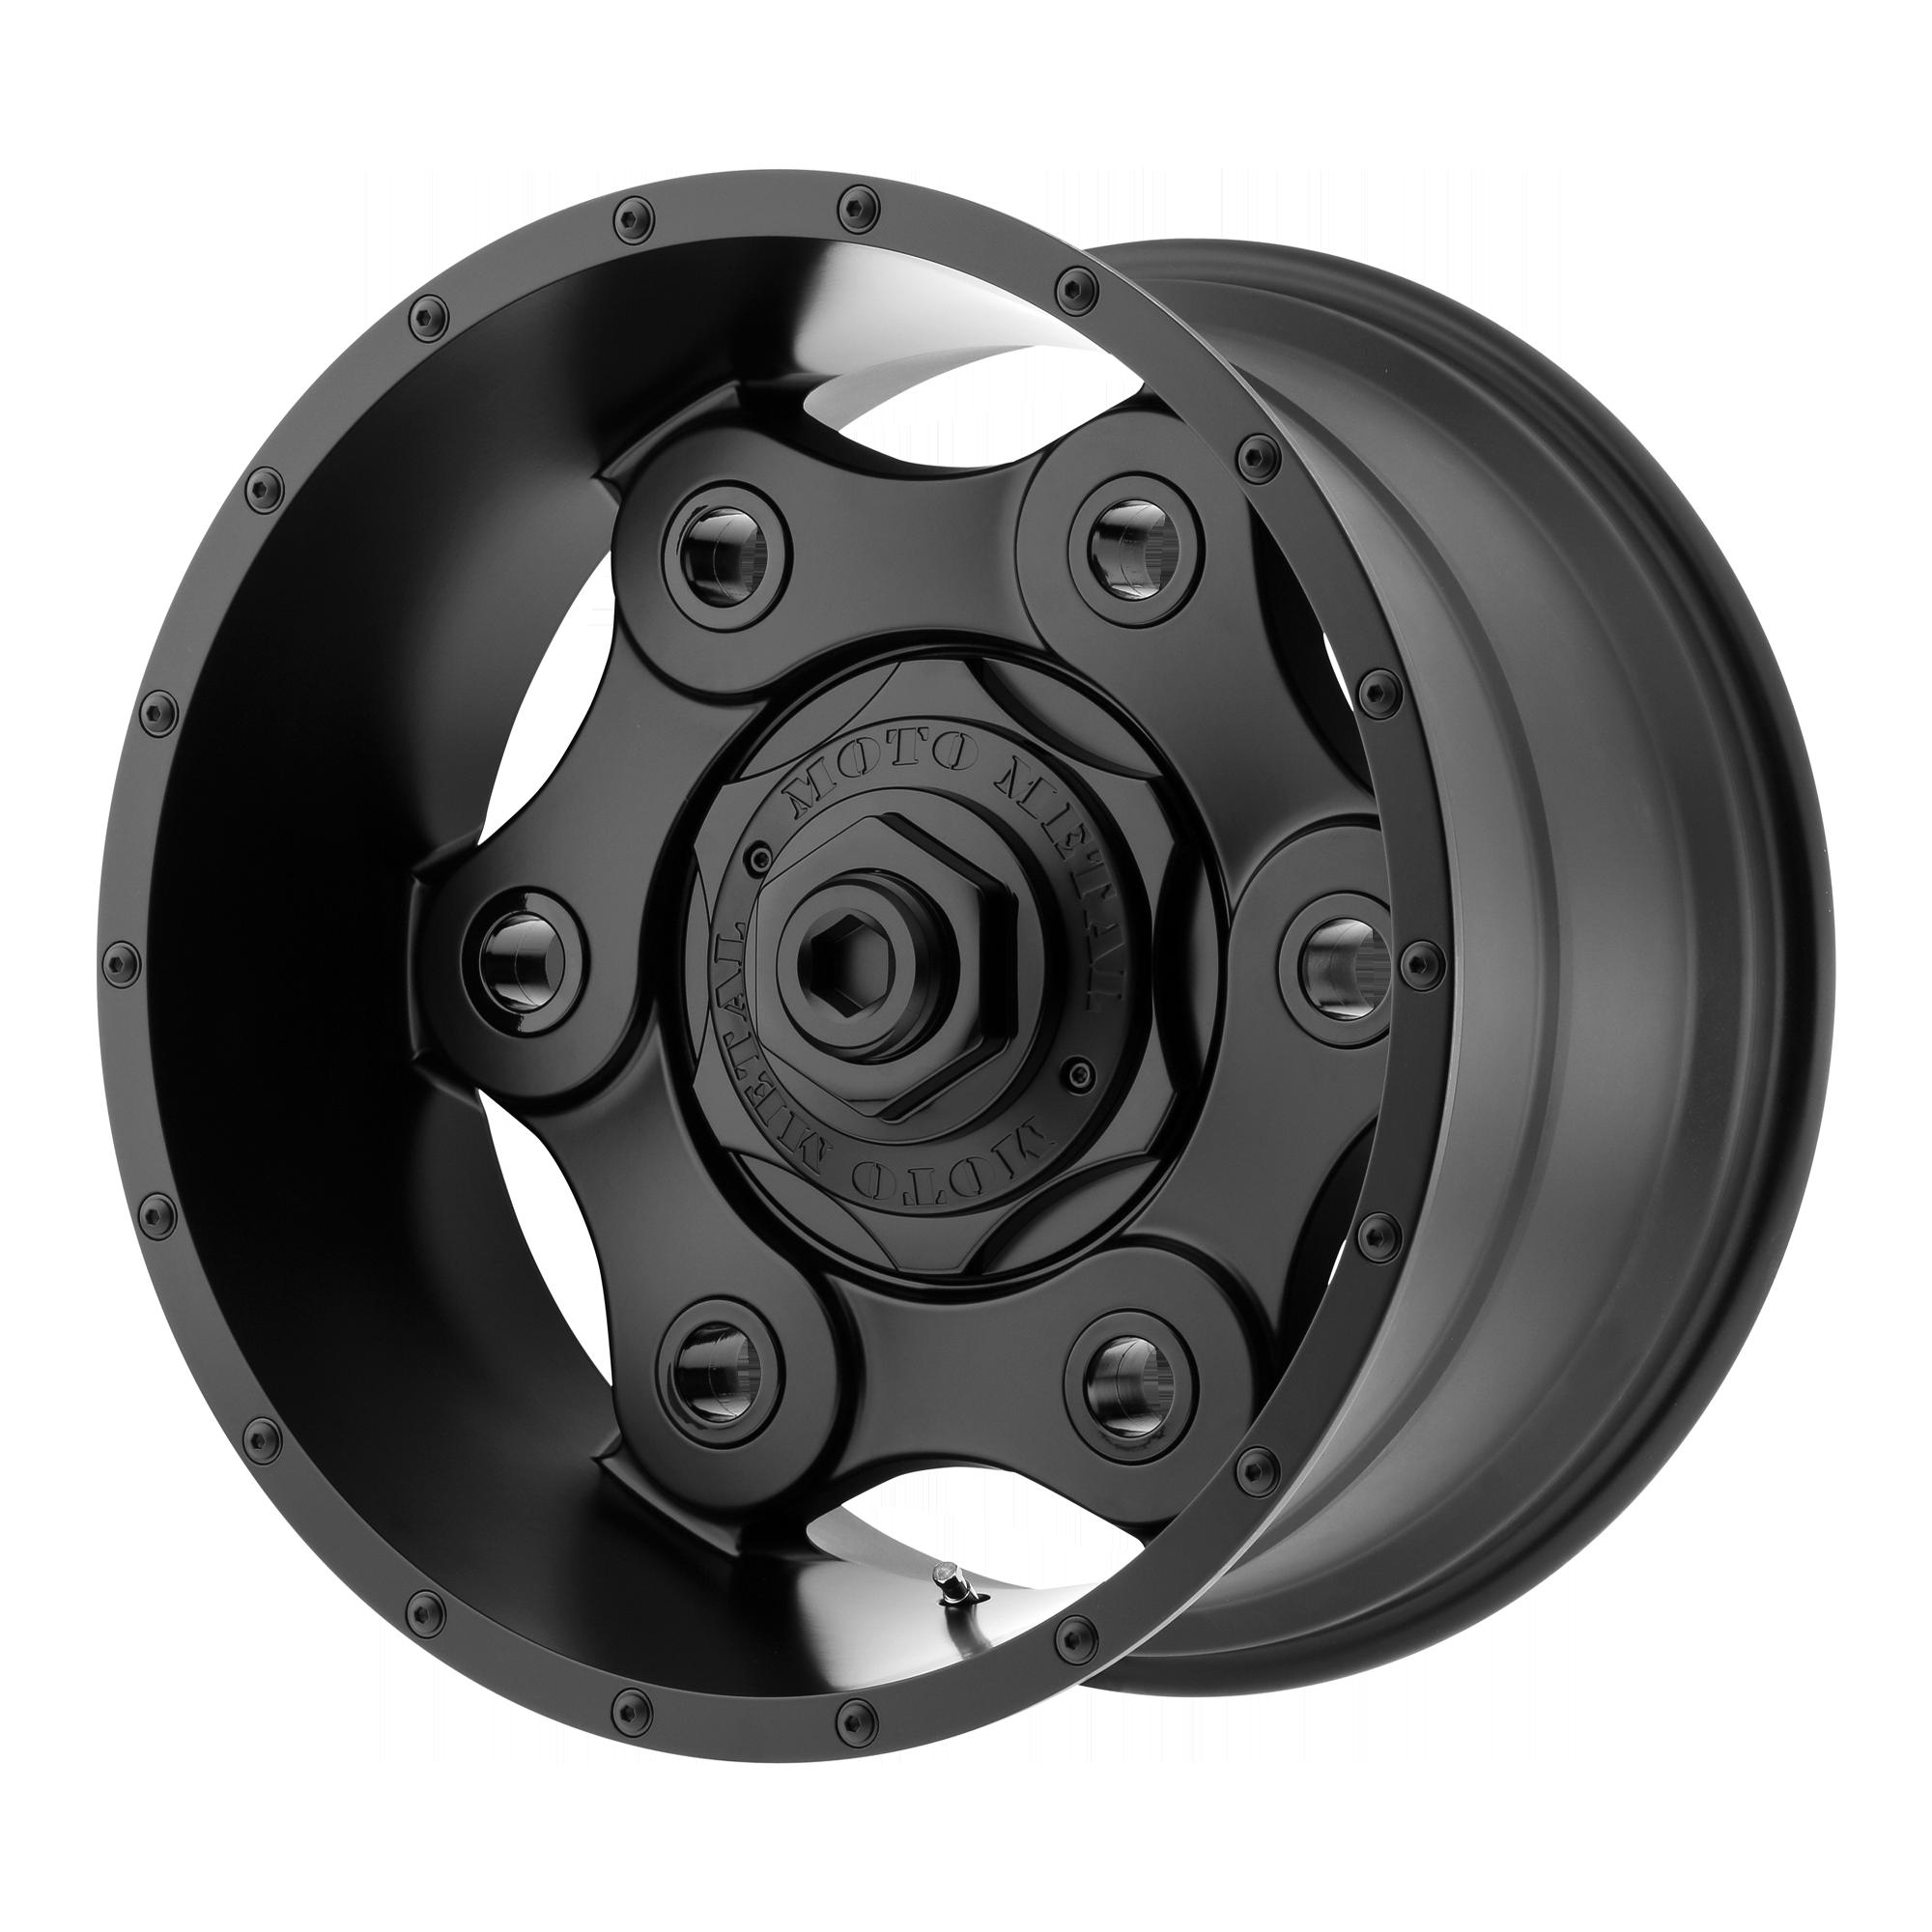 MOTO METAL MO977 LINK hliníkové disky 9x17 5x127 ET25 Black Out